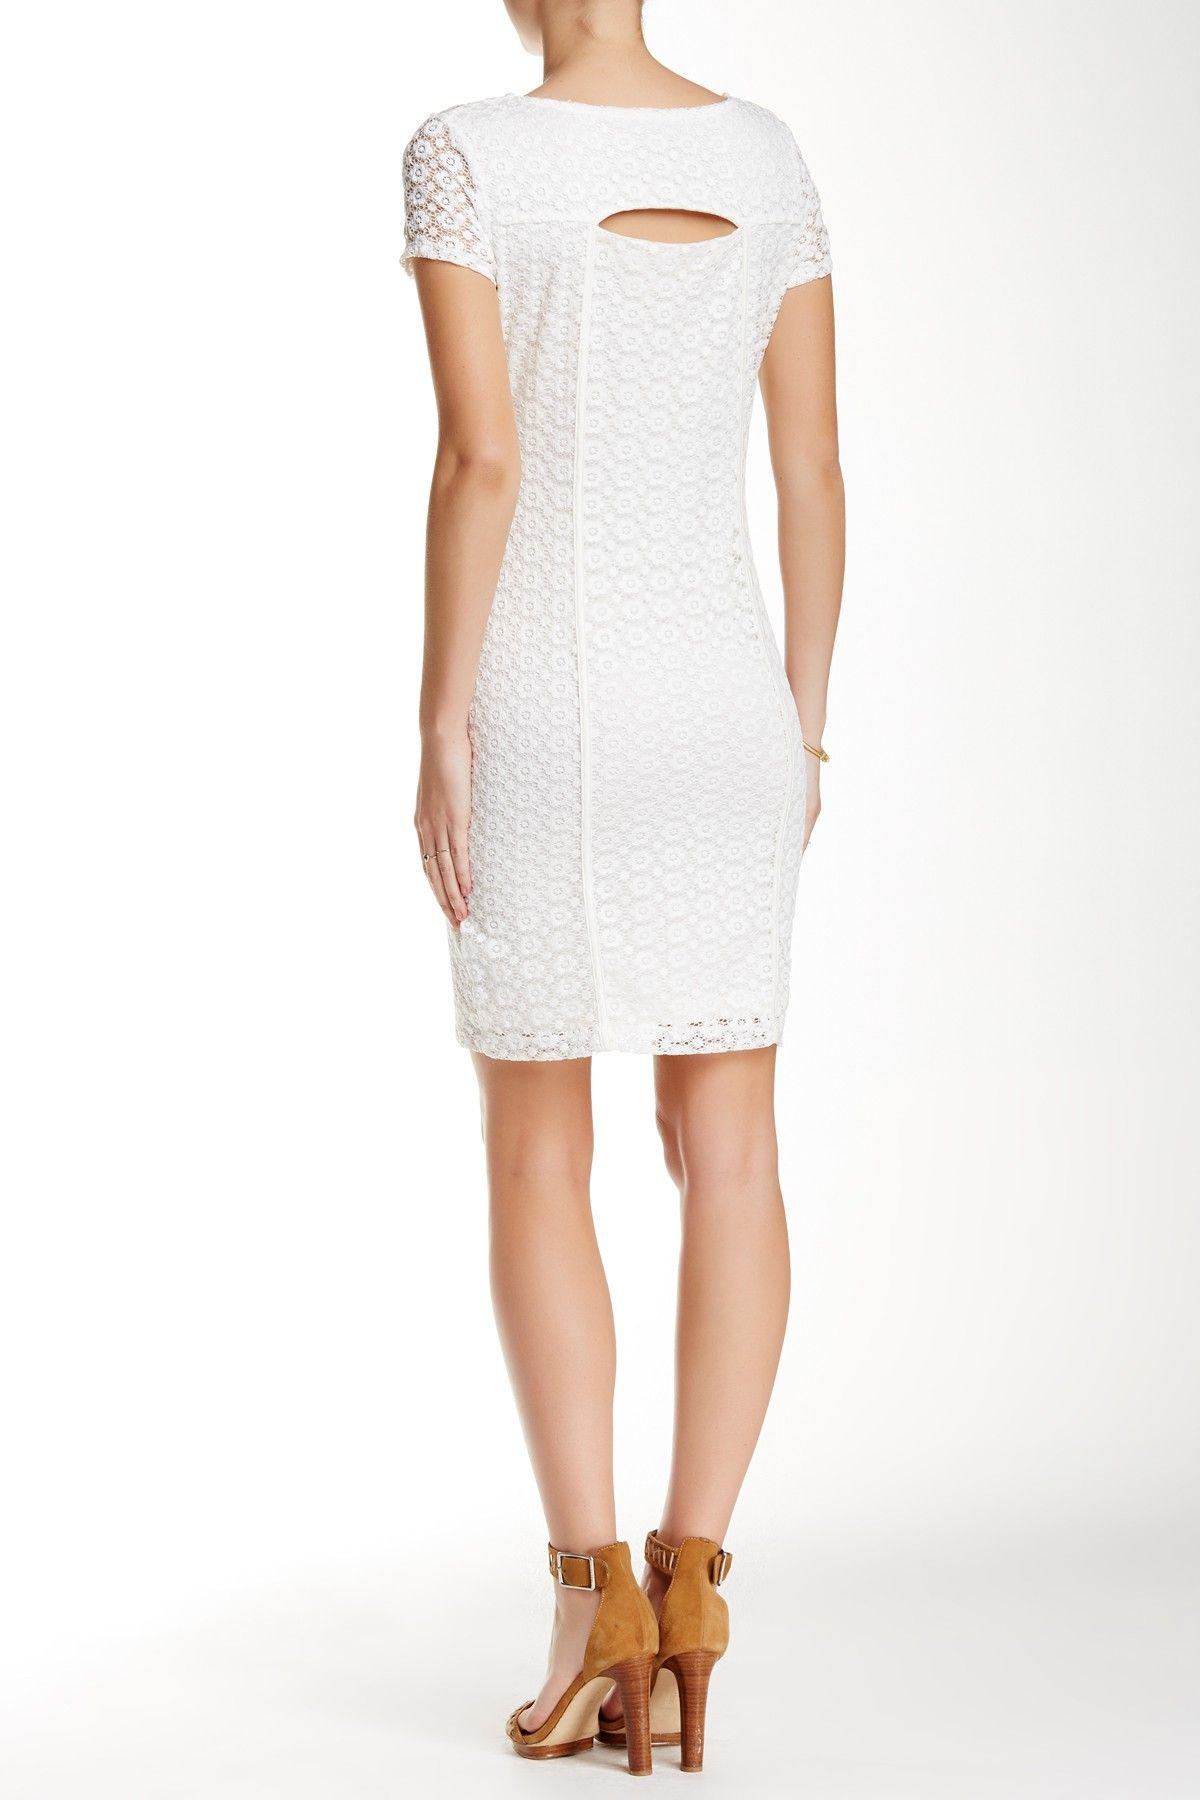 Leilah Short Sleeve Lace Dress by Tart on @nordstrom_rack